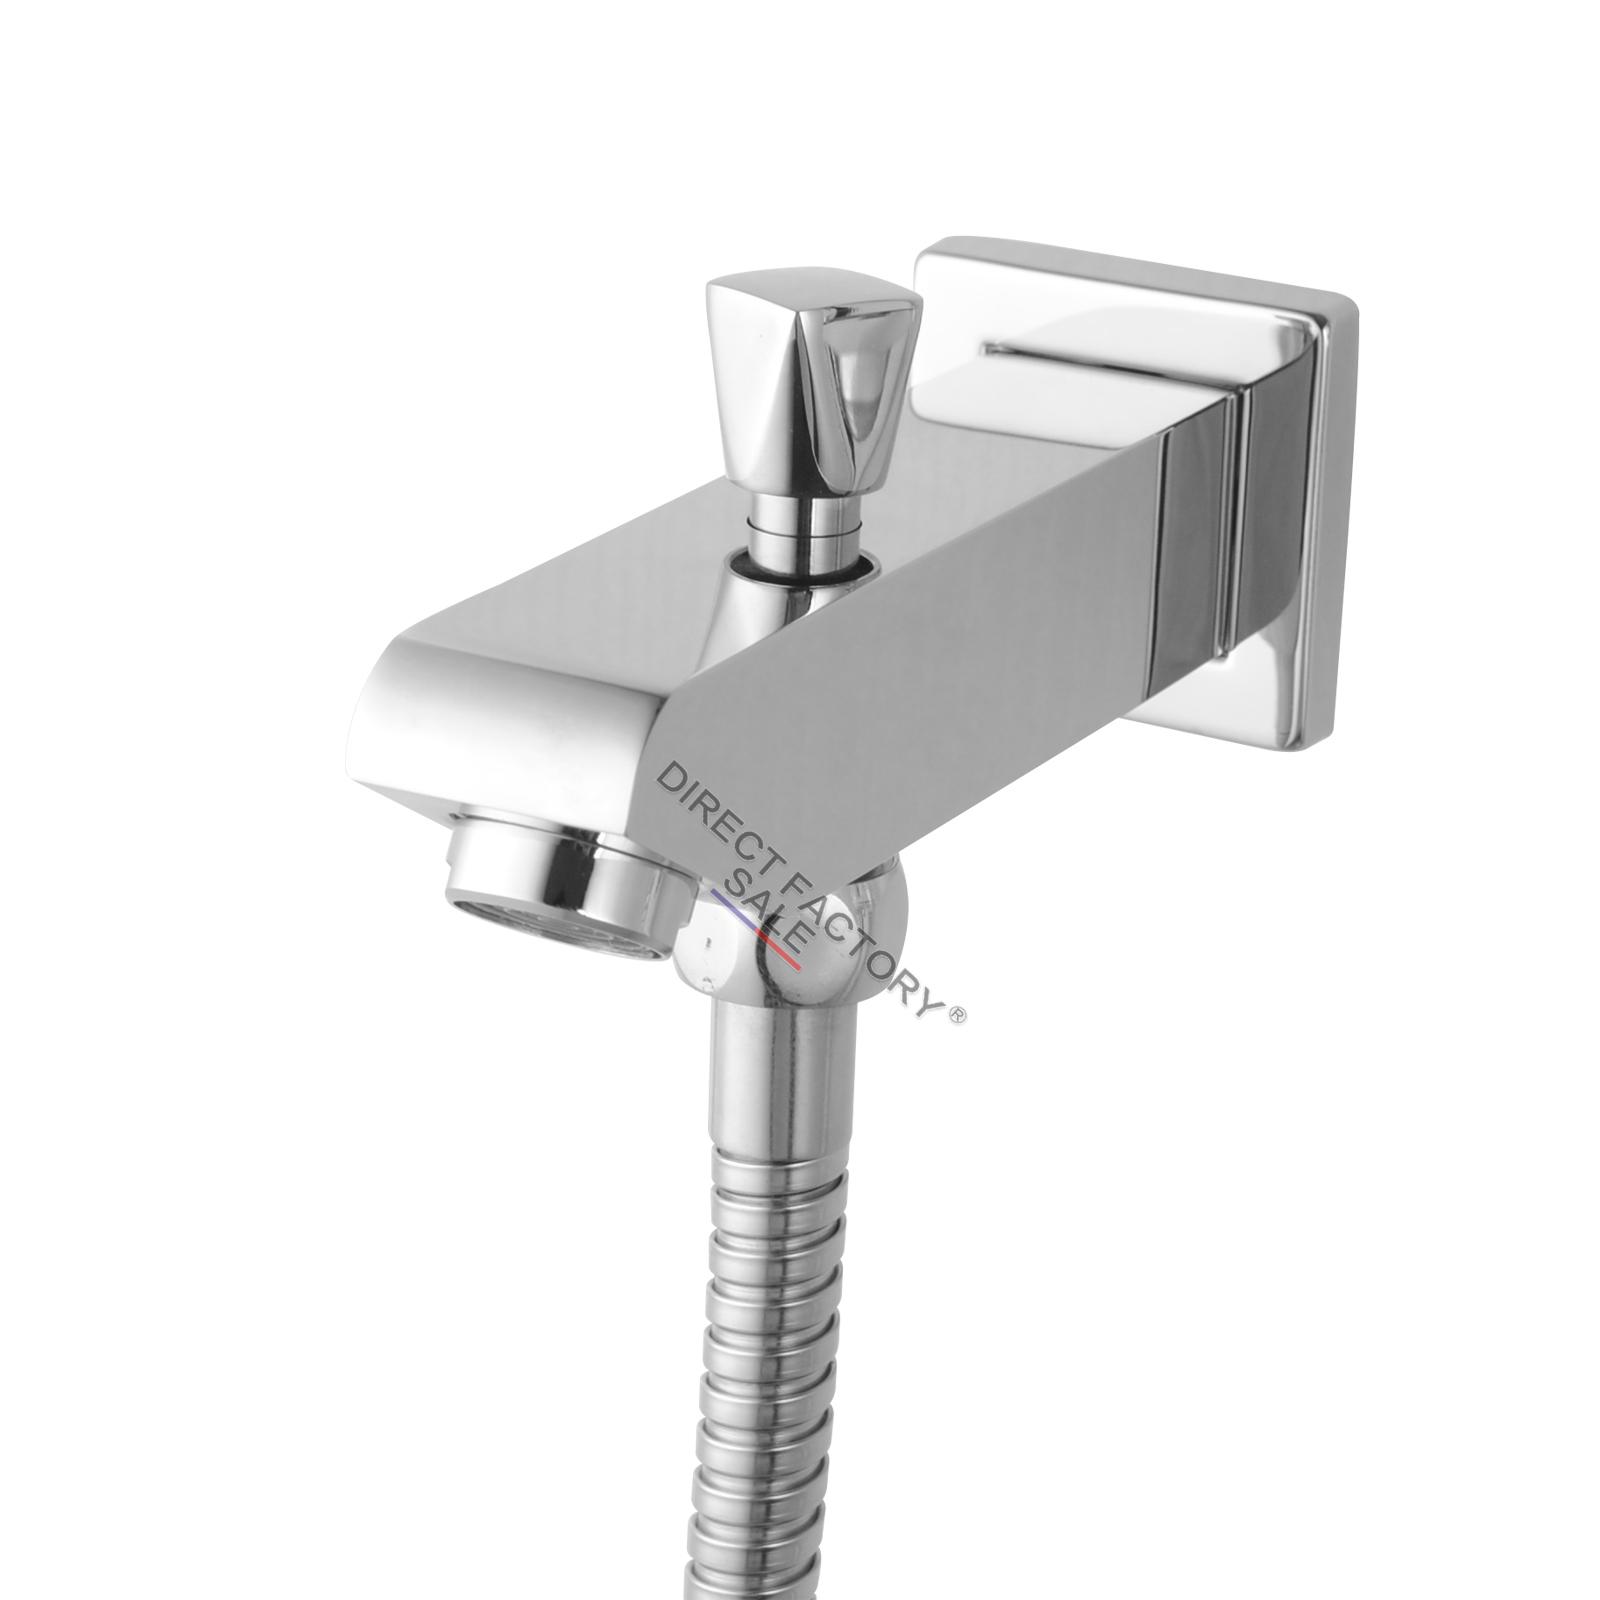 cubic chrome bath shower spout diverter w handheld shower spa chrome wall mount. Black Bedroom Furniture Sets. Home Design Ideas